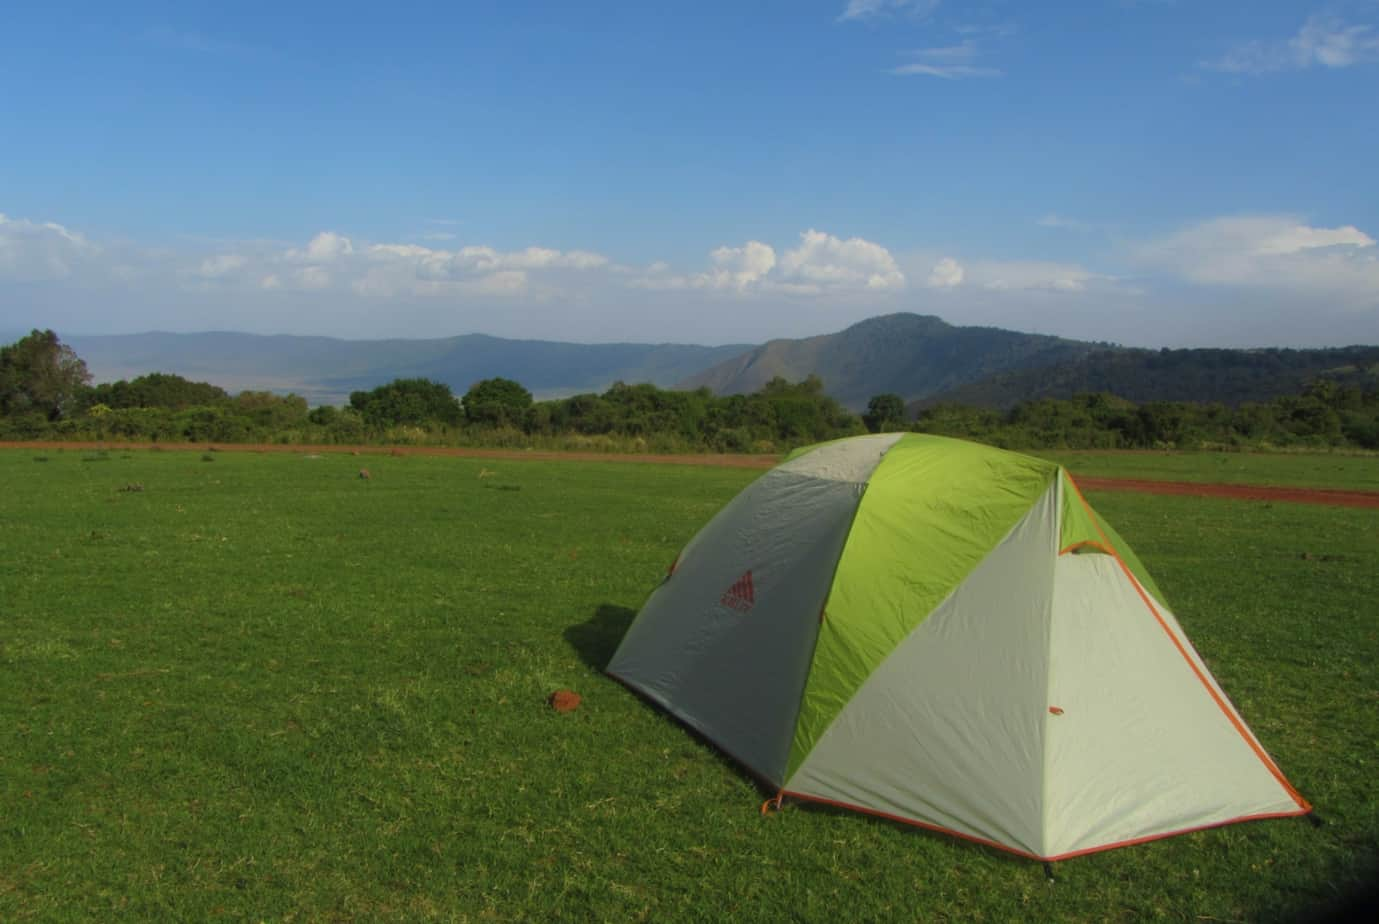 Camping at Simba Campsite